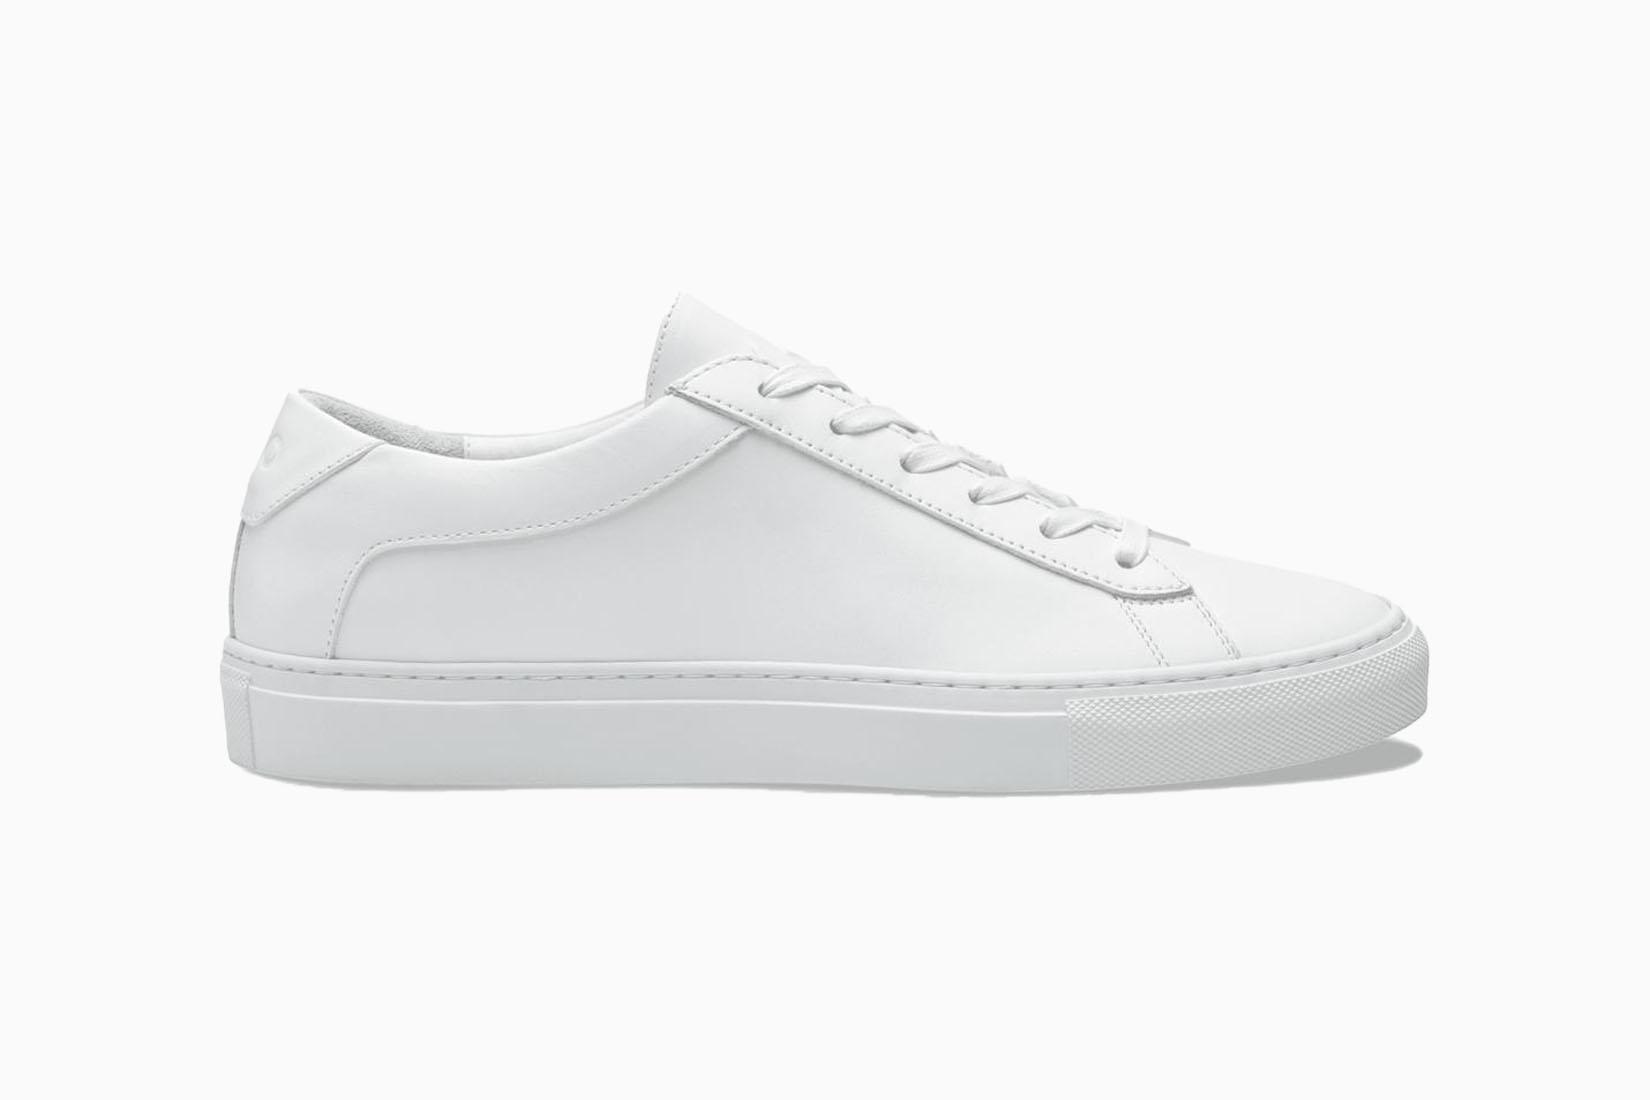 best sneakers women koio review Luxe Digital